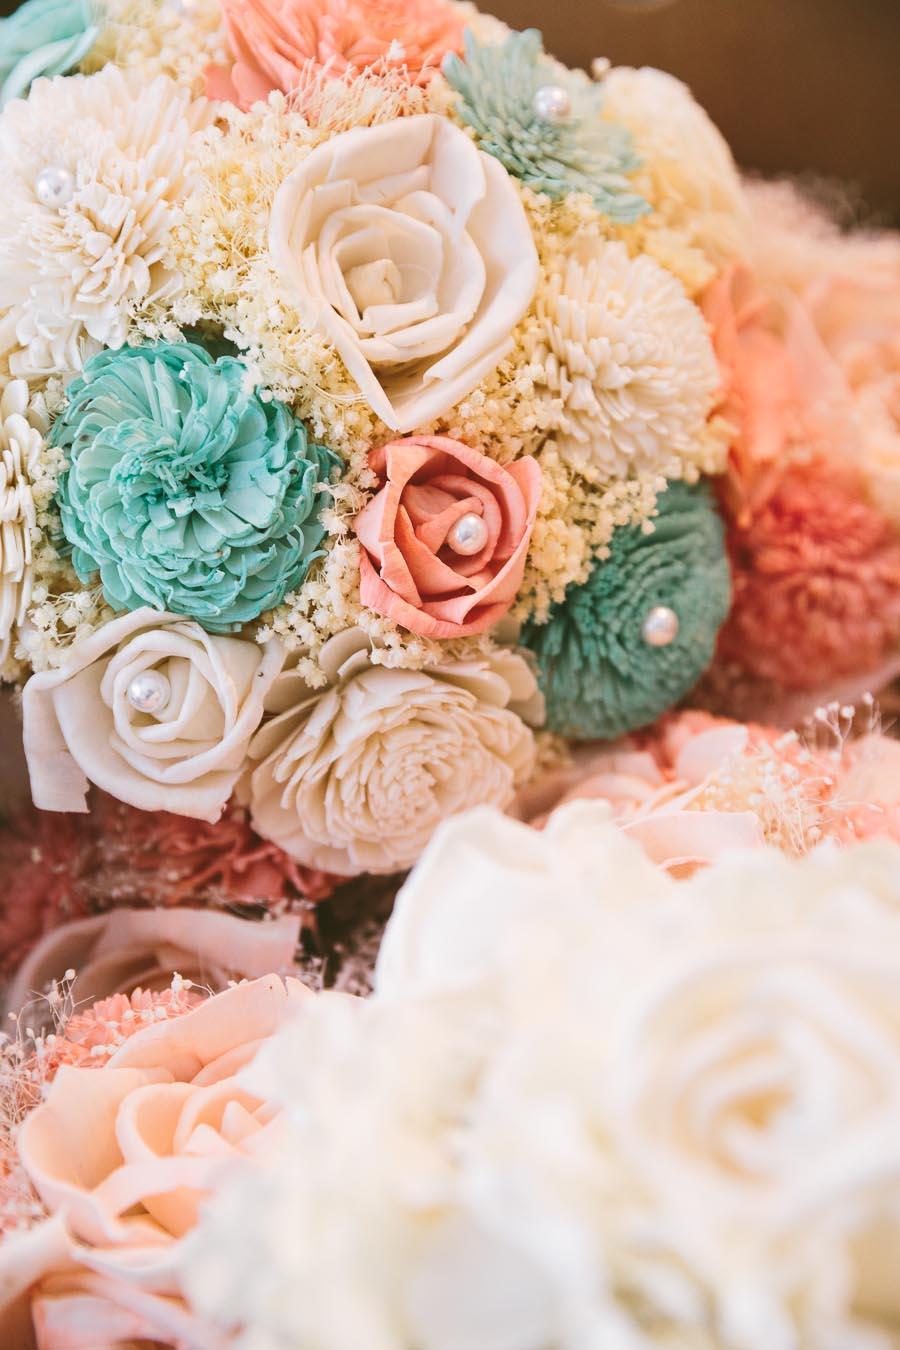 north-olmstead-wedding-photography-at-rubys-grafton-9.jpg